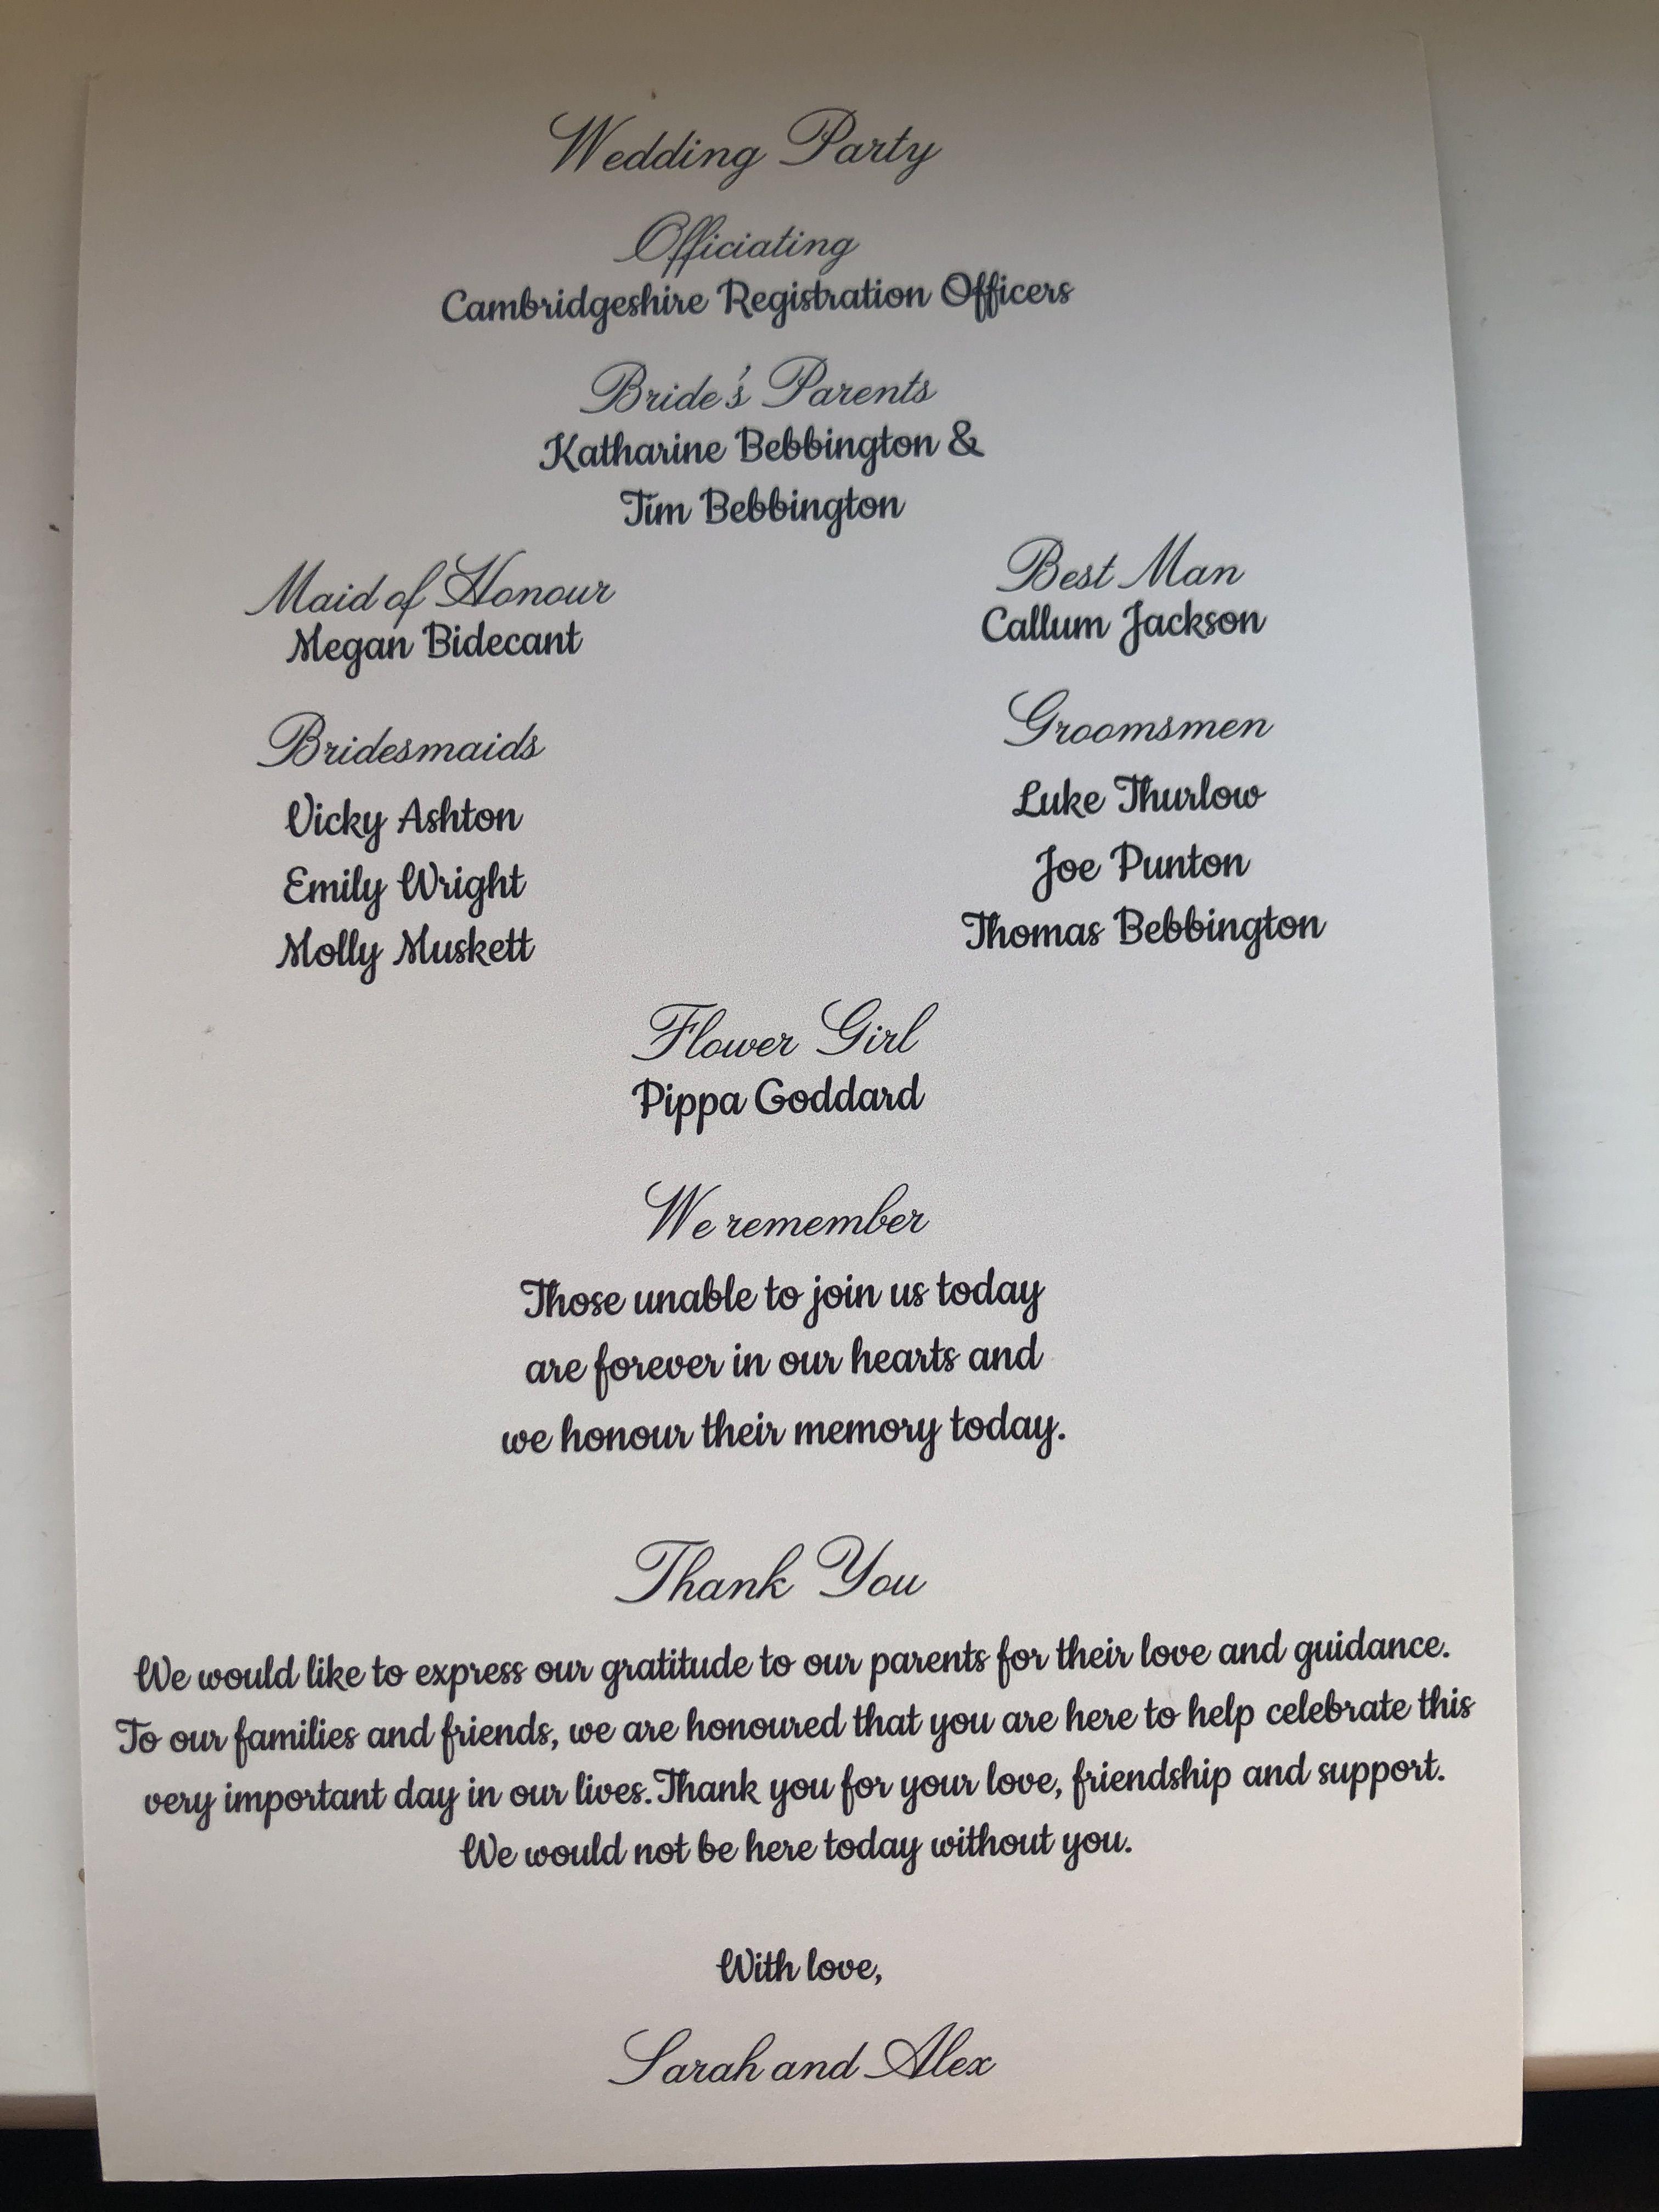 Pin By Sarah Bebbington On Wedding We Remember Flower Girl Cambridgeshire